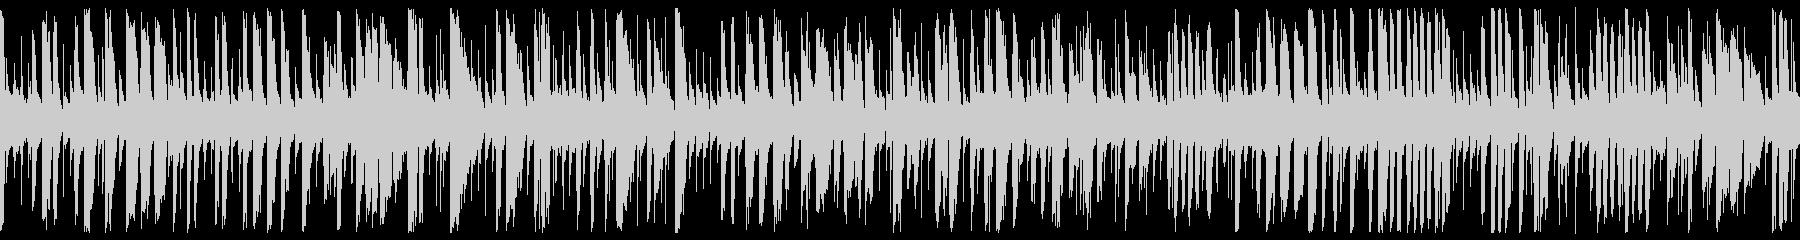 Energetic and fast jazz piano BGM (loop)'s unreproduced waveform